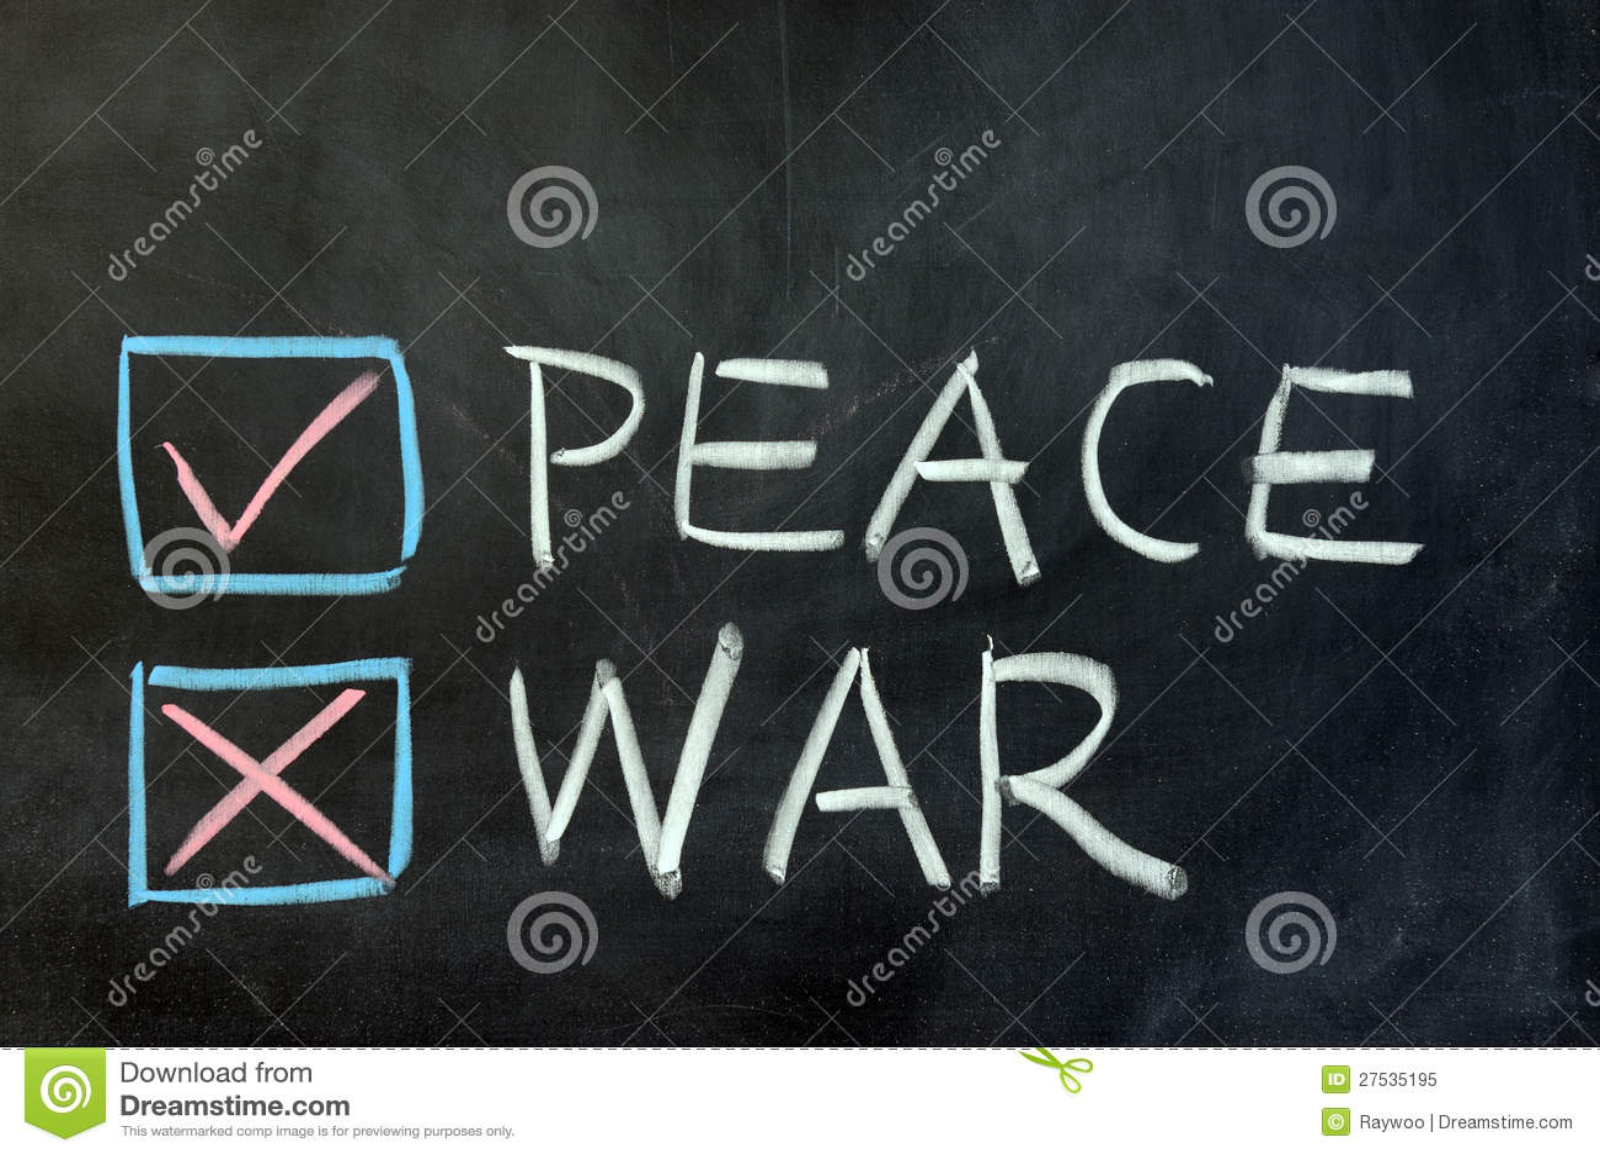 Citaten Oorlog En Vrede : Vrede of oorlog stock afbeelding bestaande uit